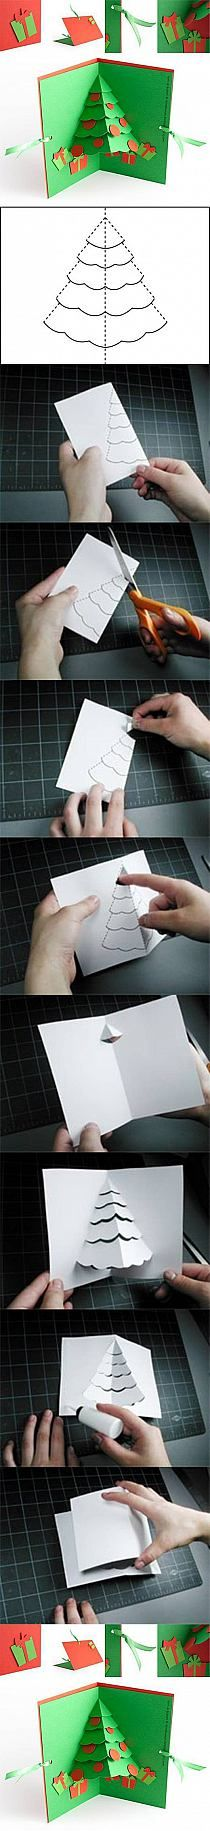 DIY Christmas Tree Pop Up Card DIY Projects | UsefulDIY…